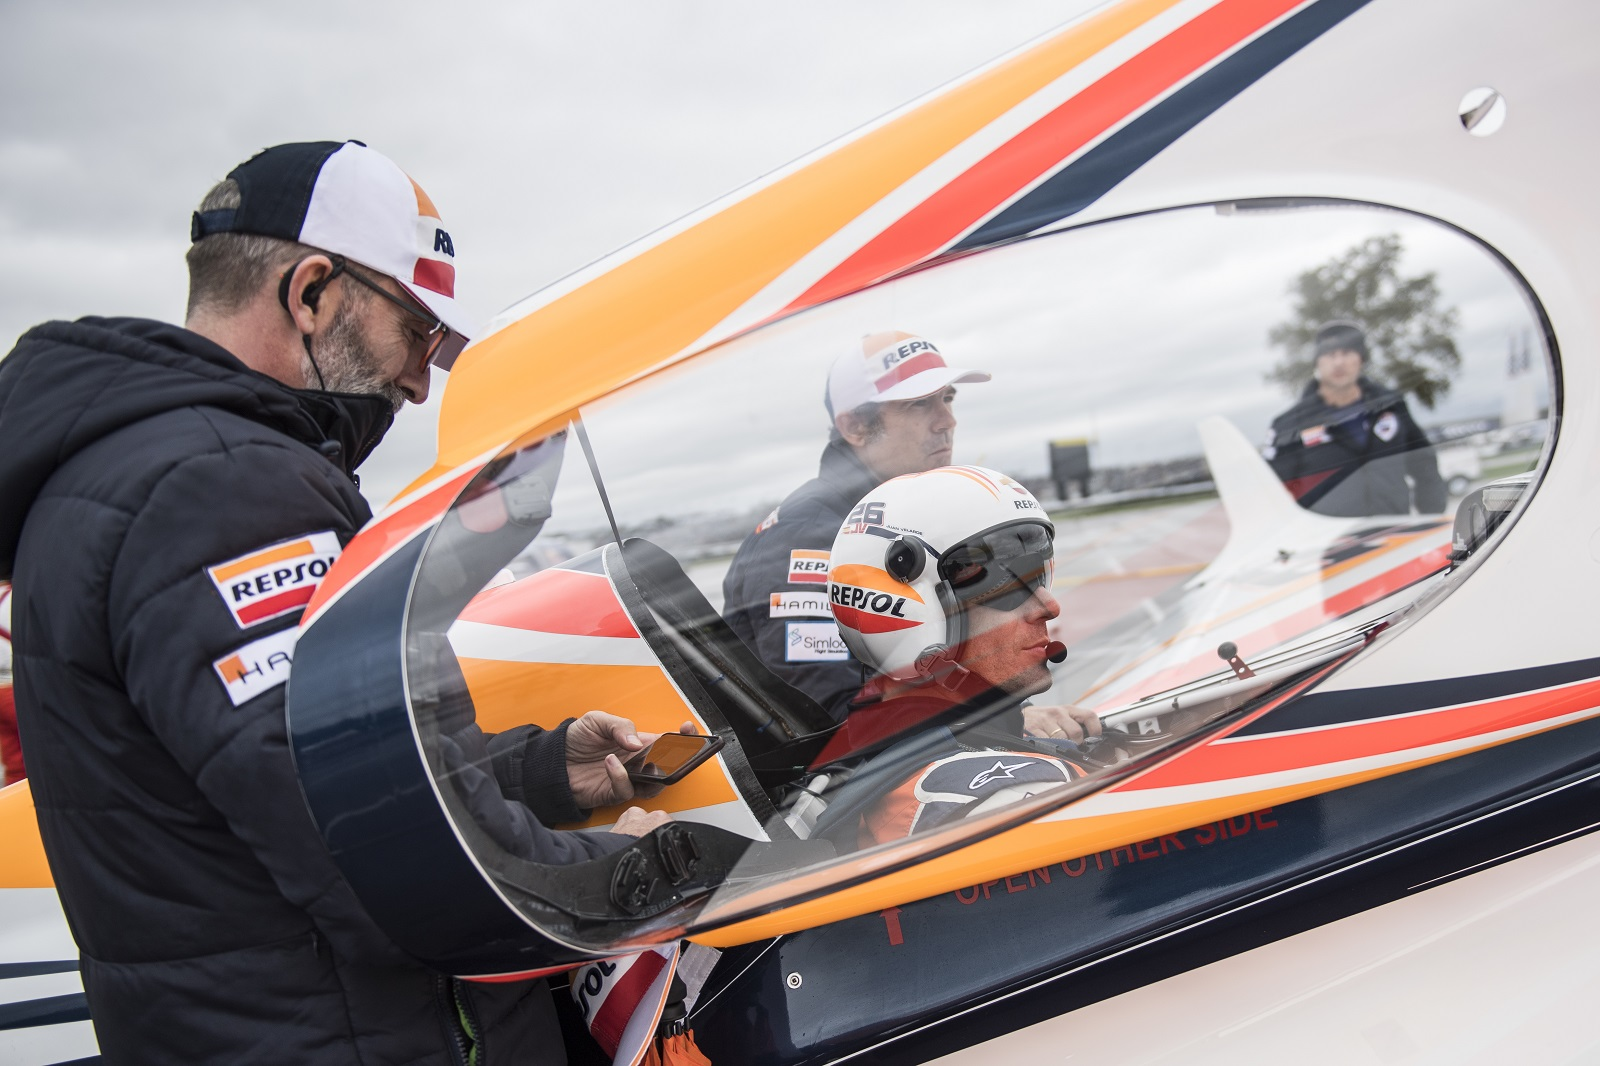 Juan Velarde en pista junto a Anselmo Gámez con la cúpula del avión abierta